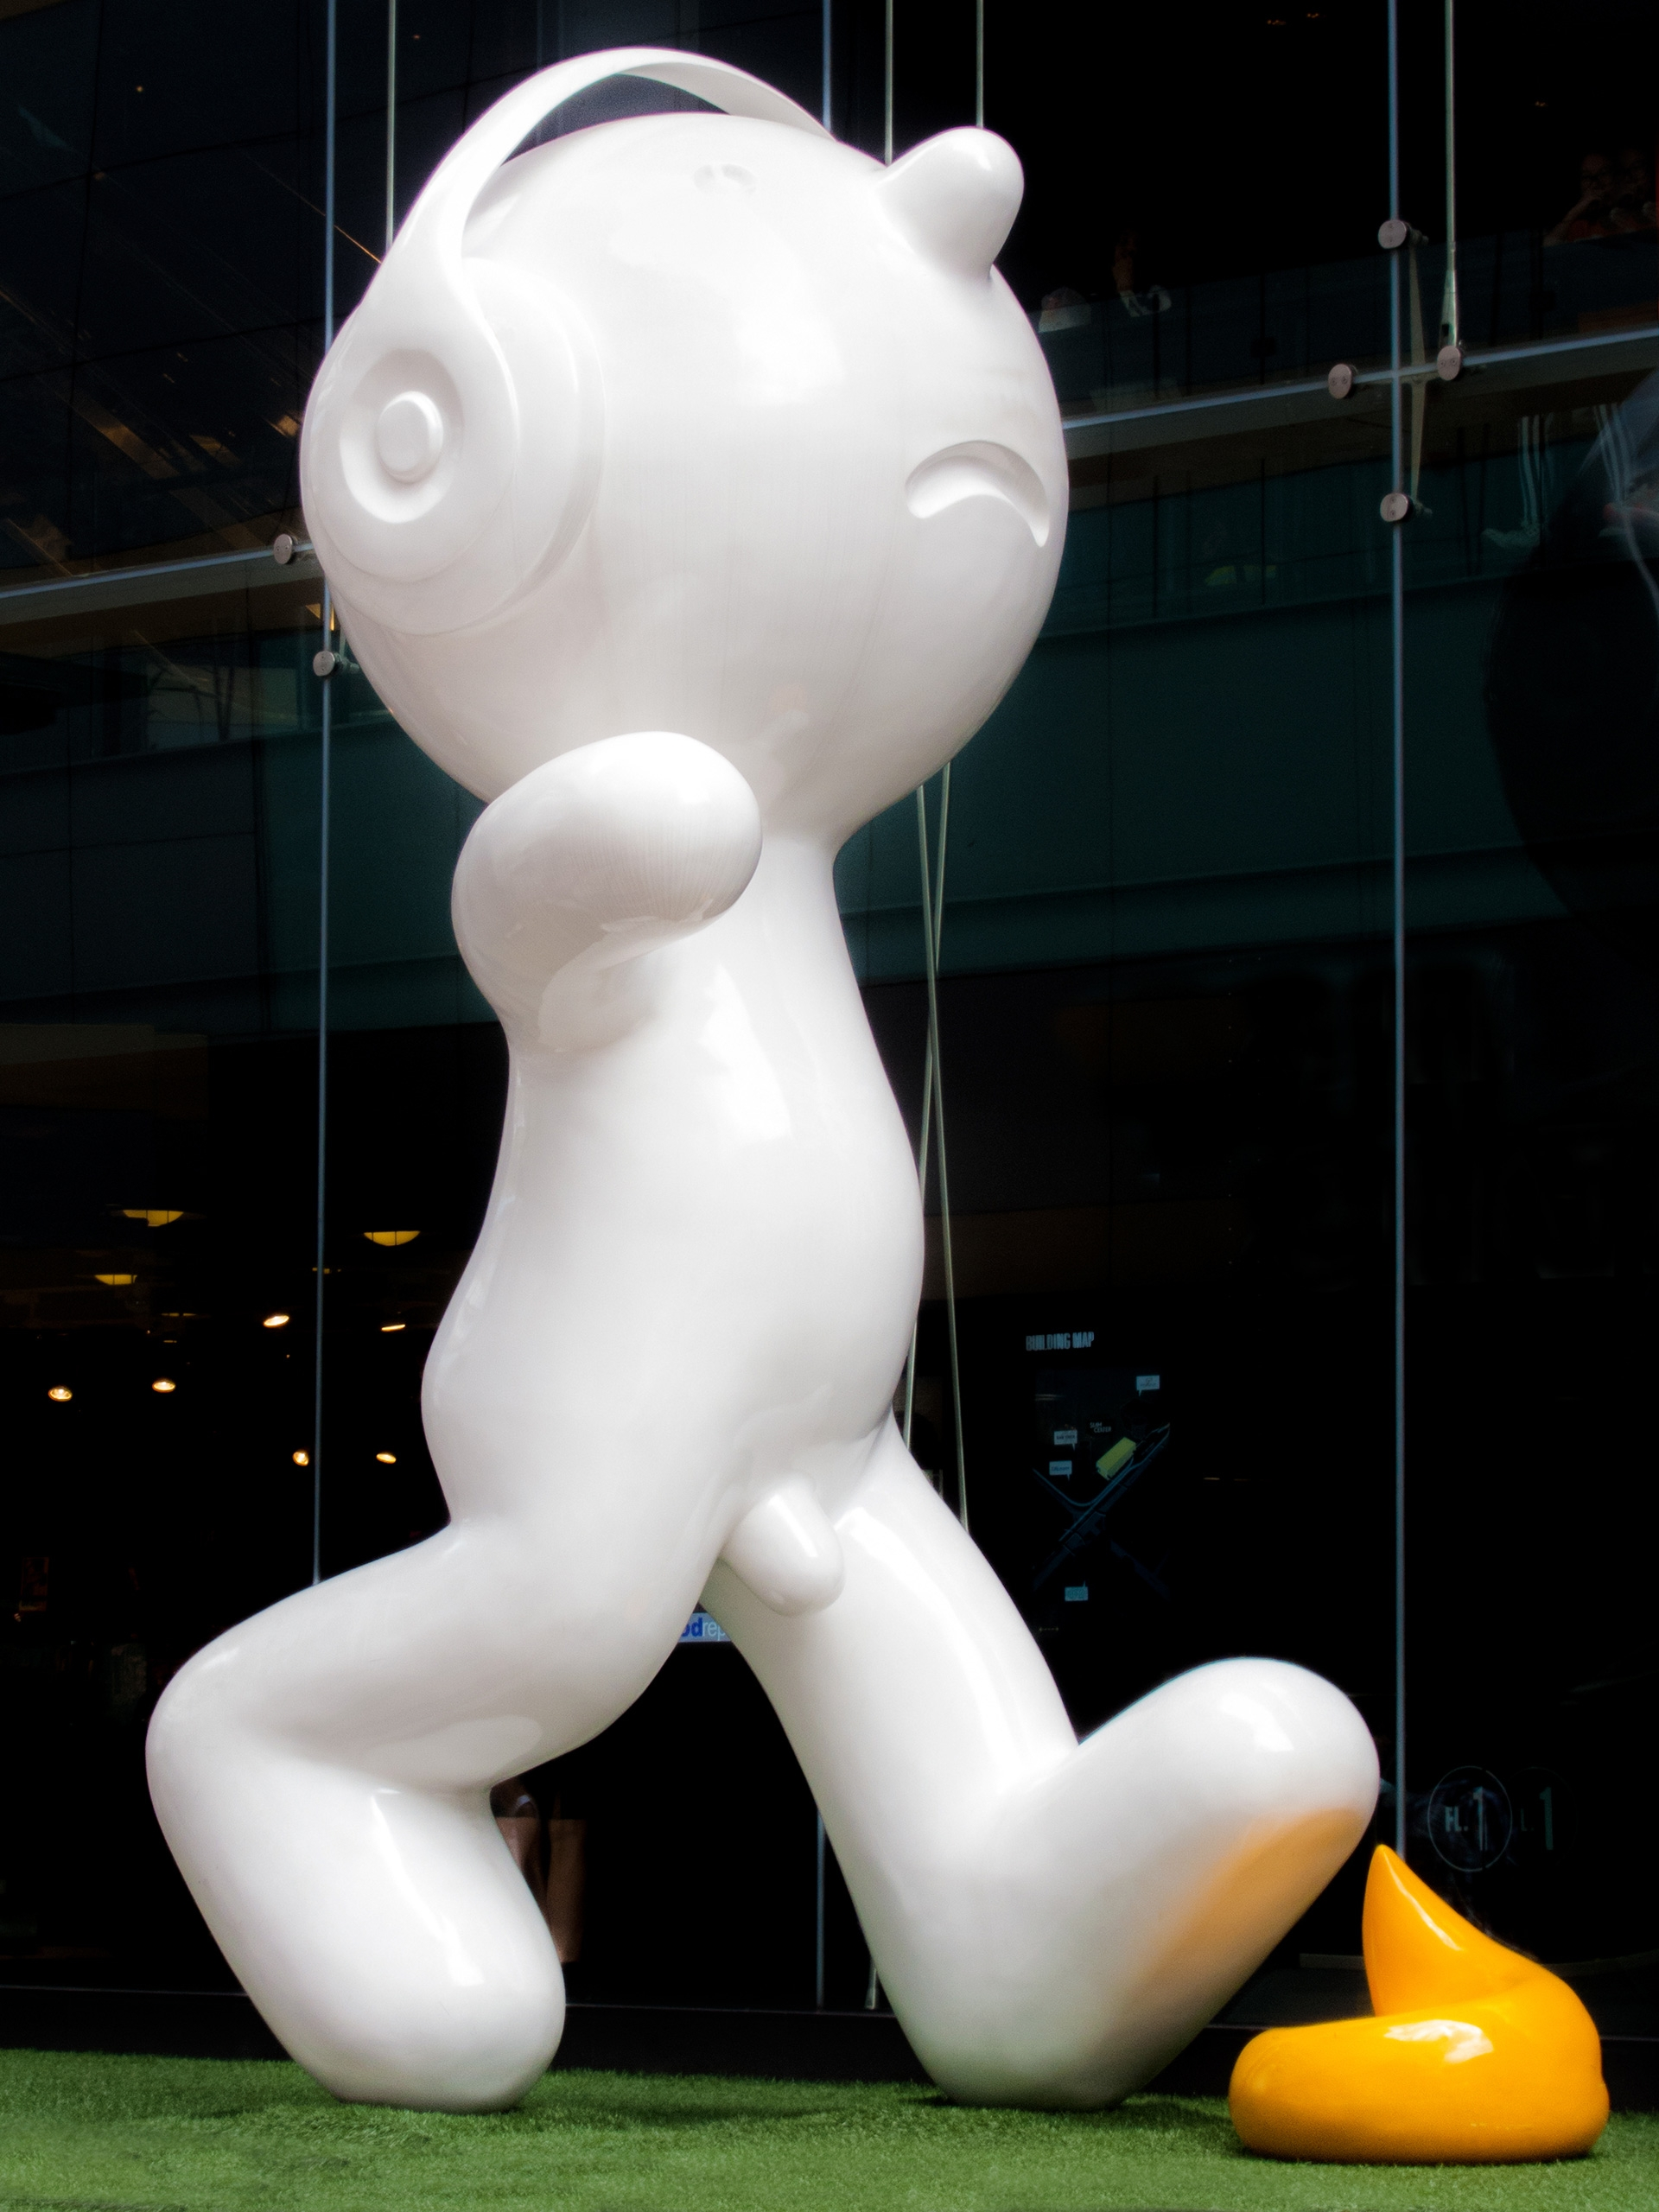 shit art - public, Bangkok, Thailand - christofkessemeier | ello